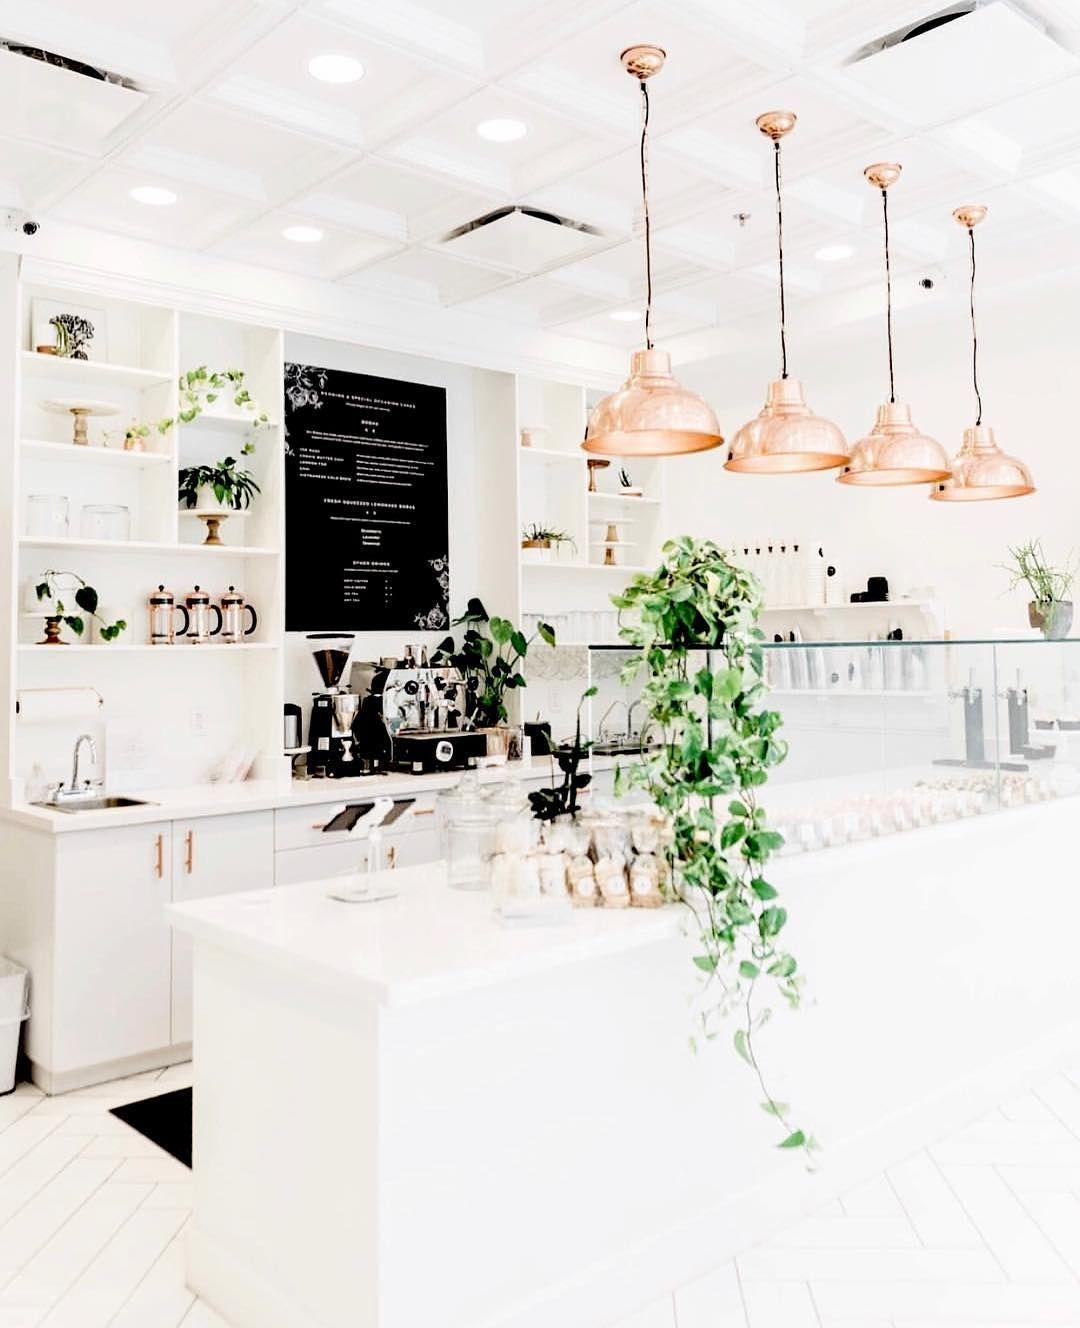 Ruze Cake House Shop Decor Inspiration Bakery Decor Inspiration Modern White Shop Decor Phoenix Trave Bakery Decor Decor Inspiration Cake Shop Interior